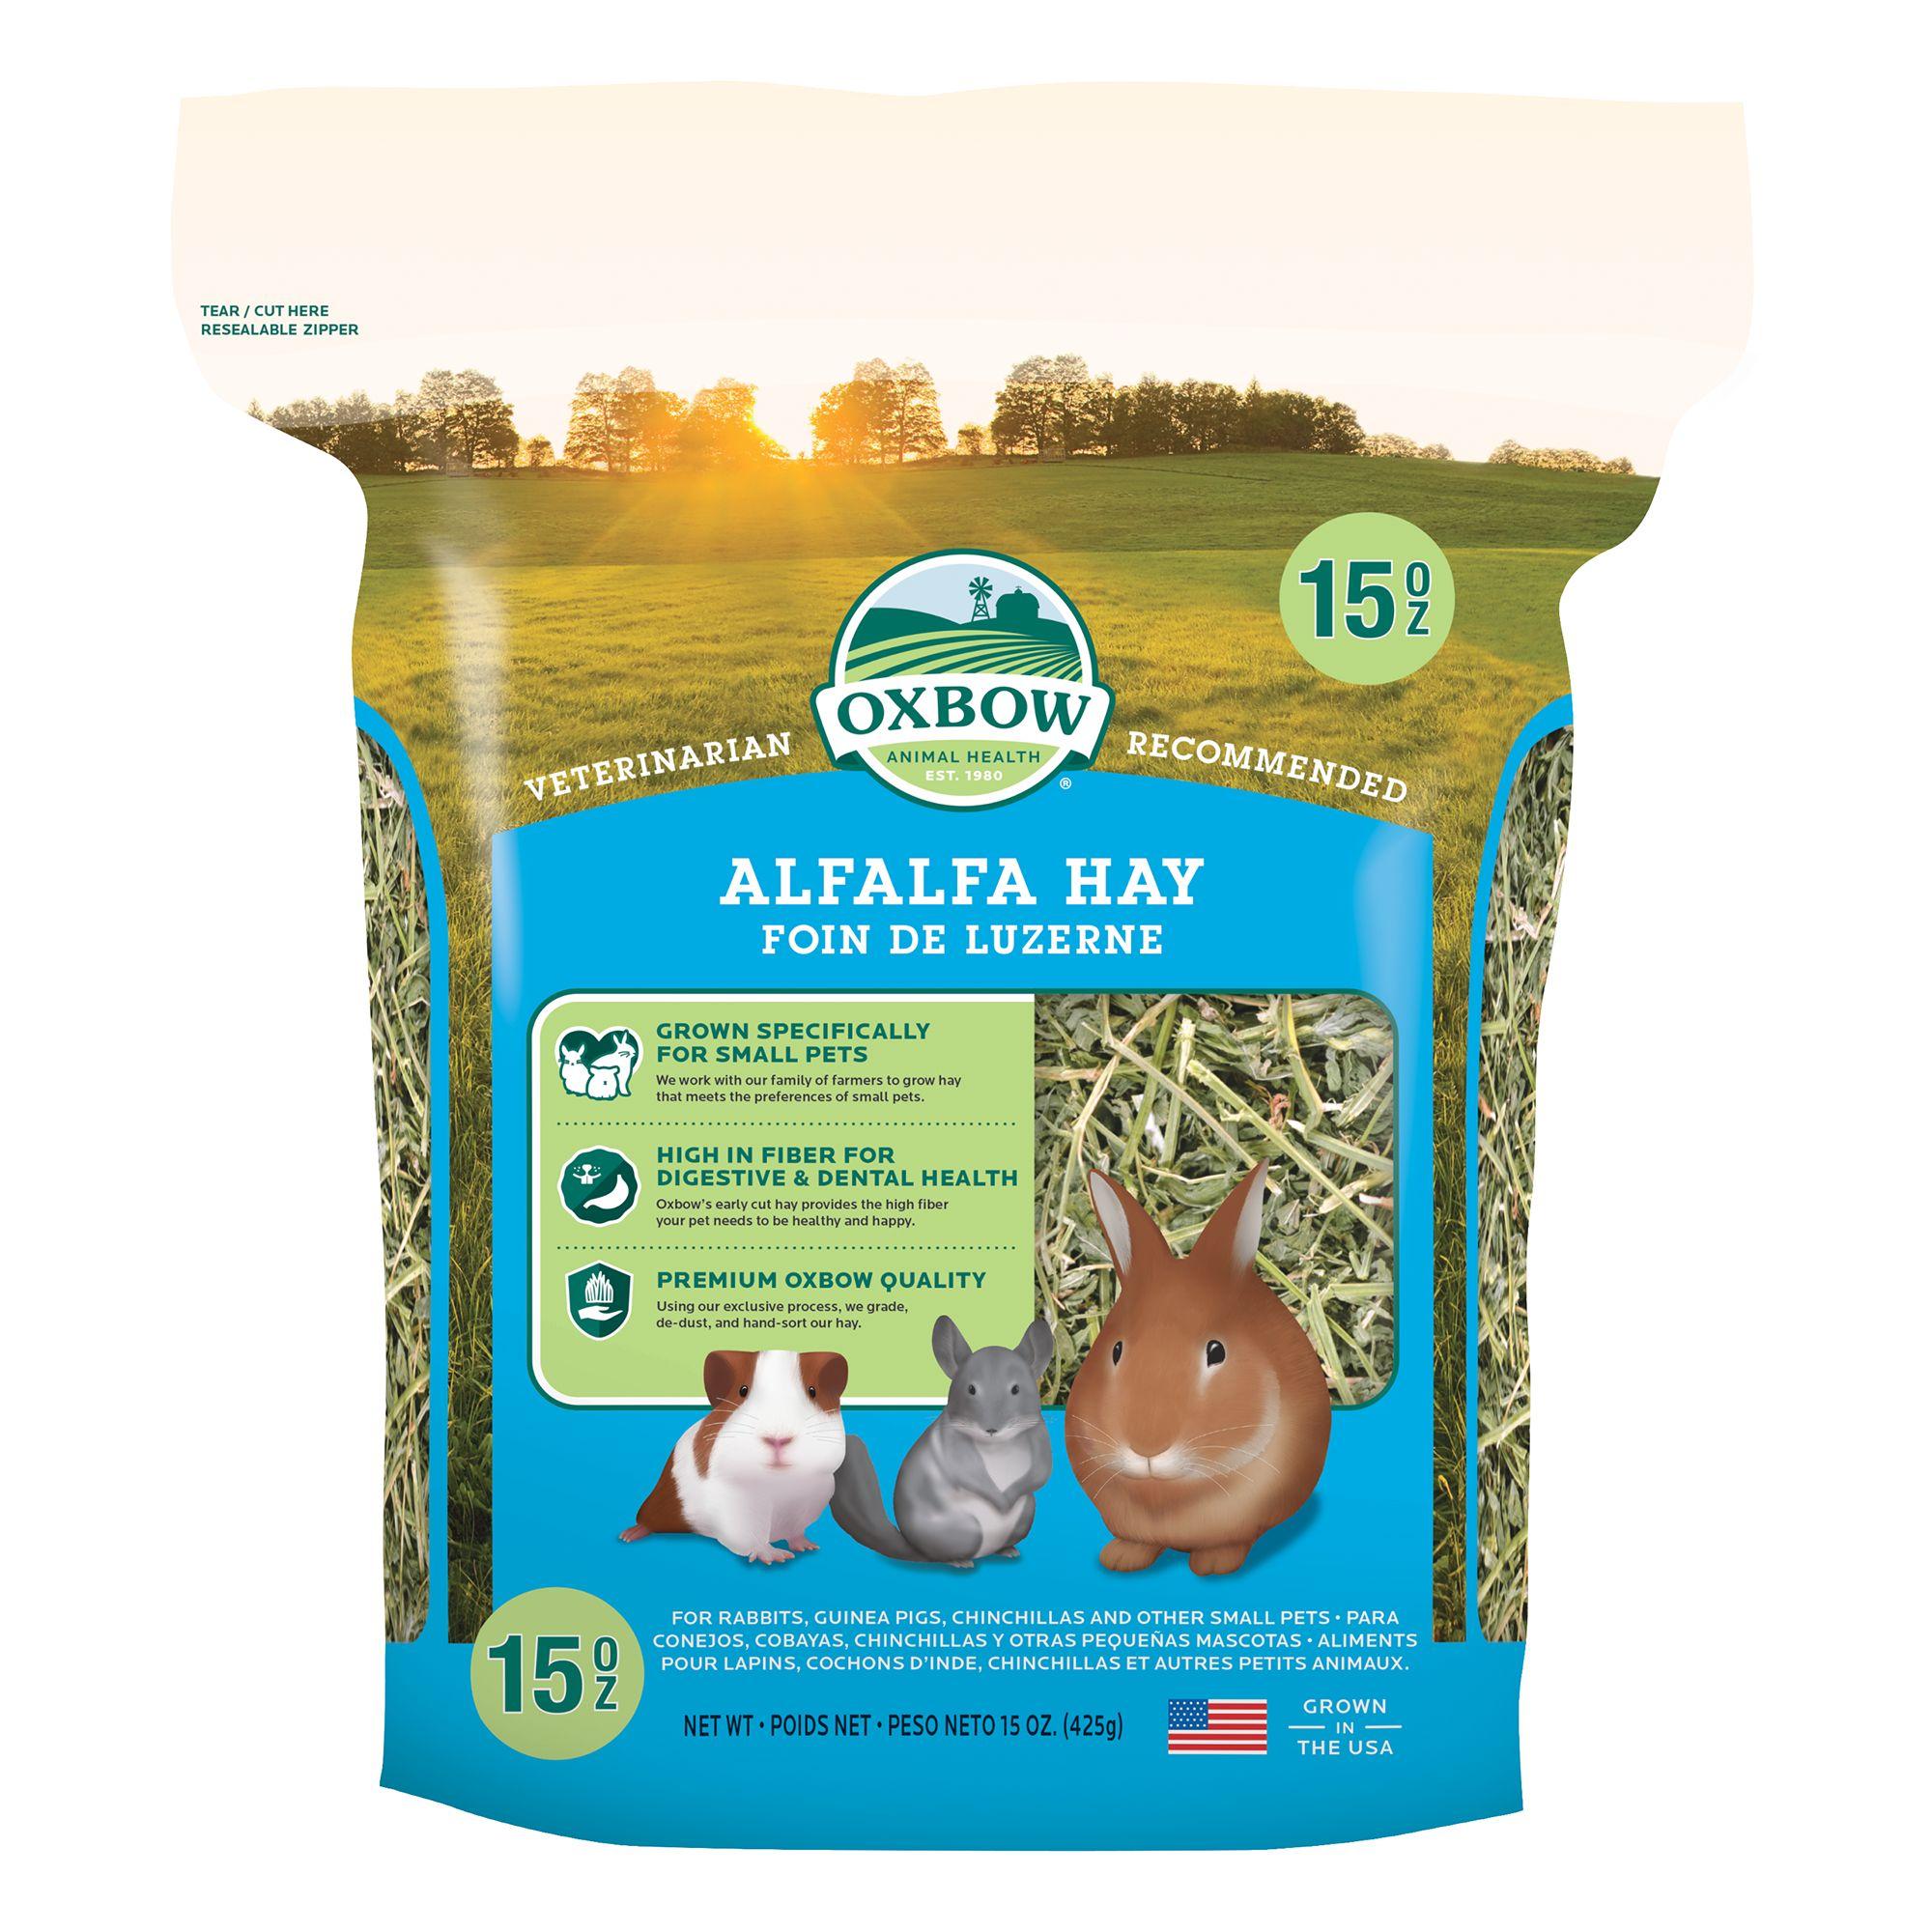 Oxbow Alfalfa Hay Size 15 Oz